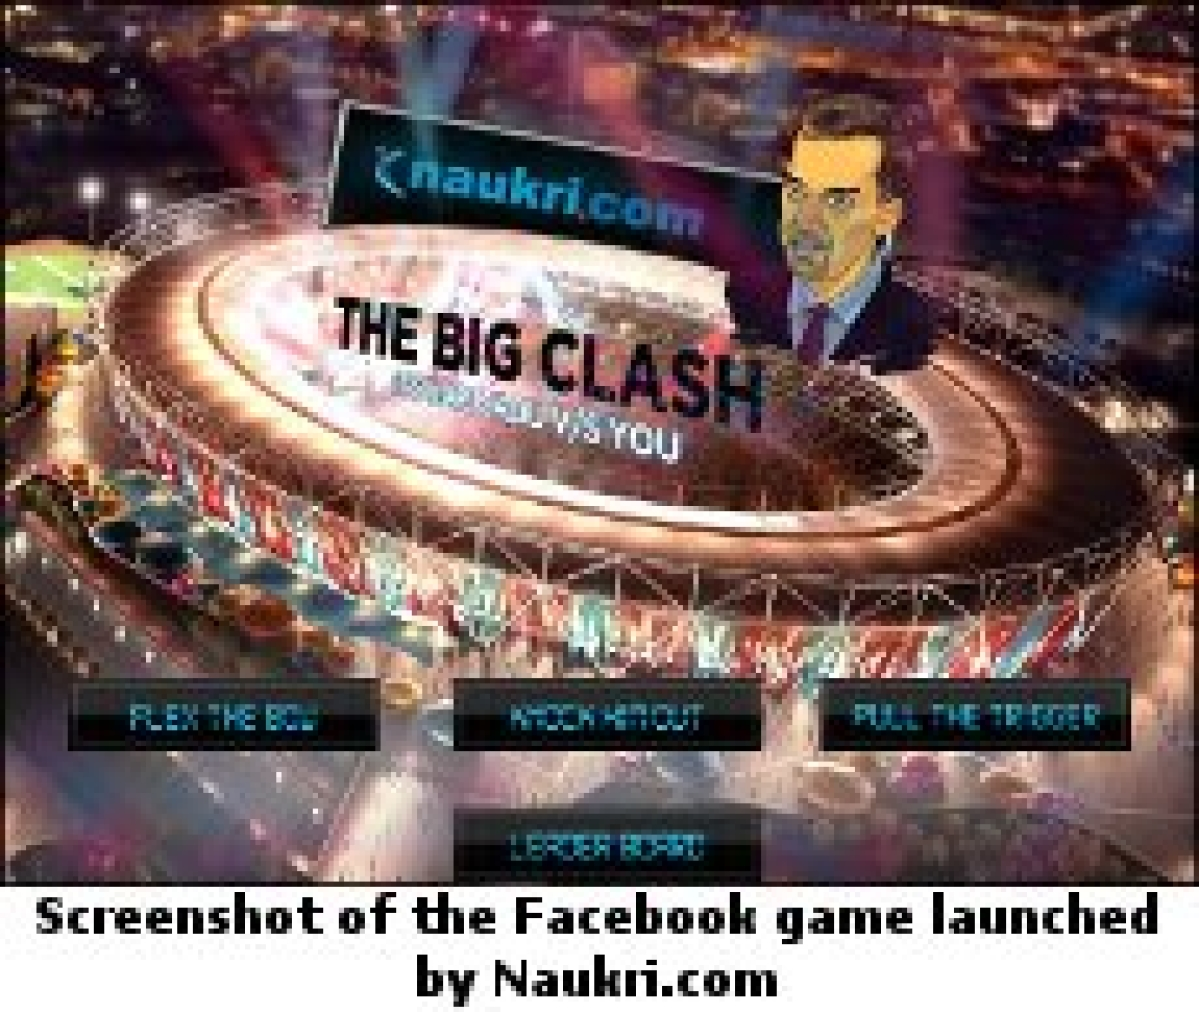 Naukri.com launches social game, The Big Clash